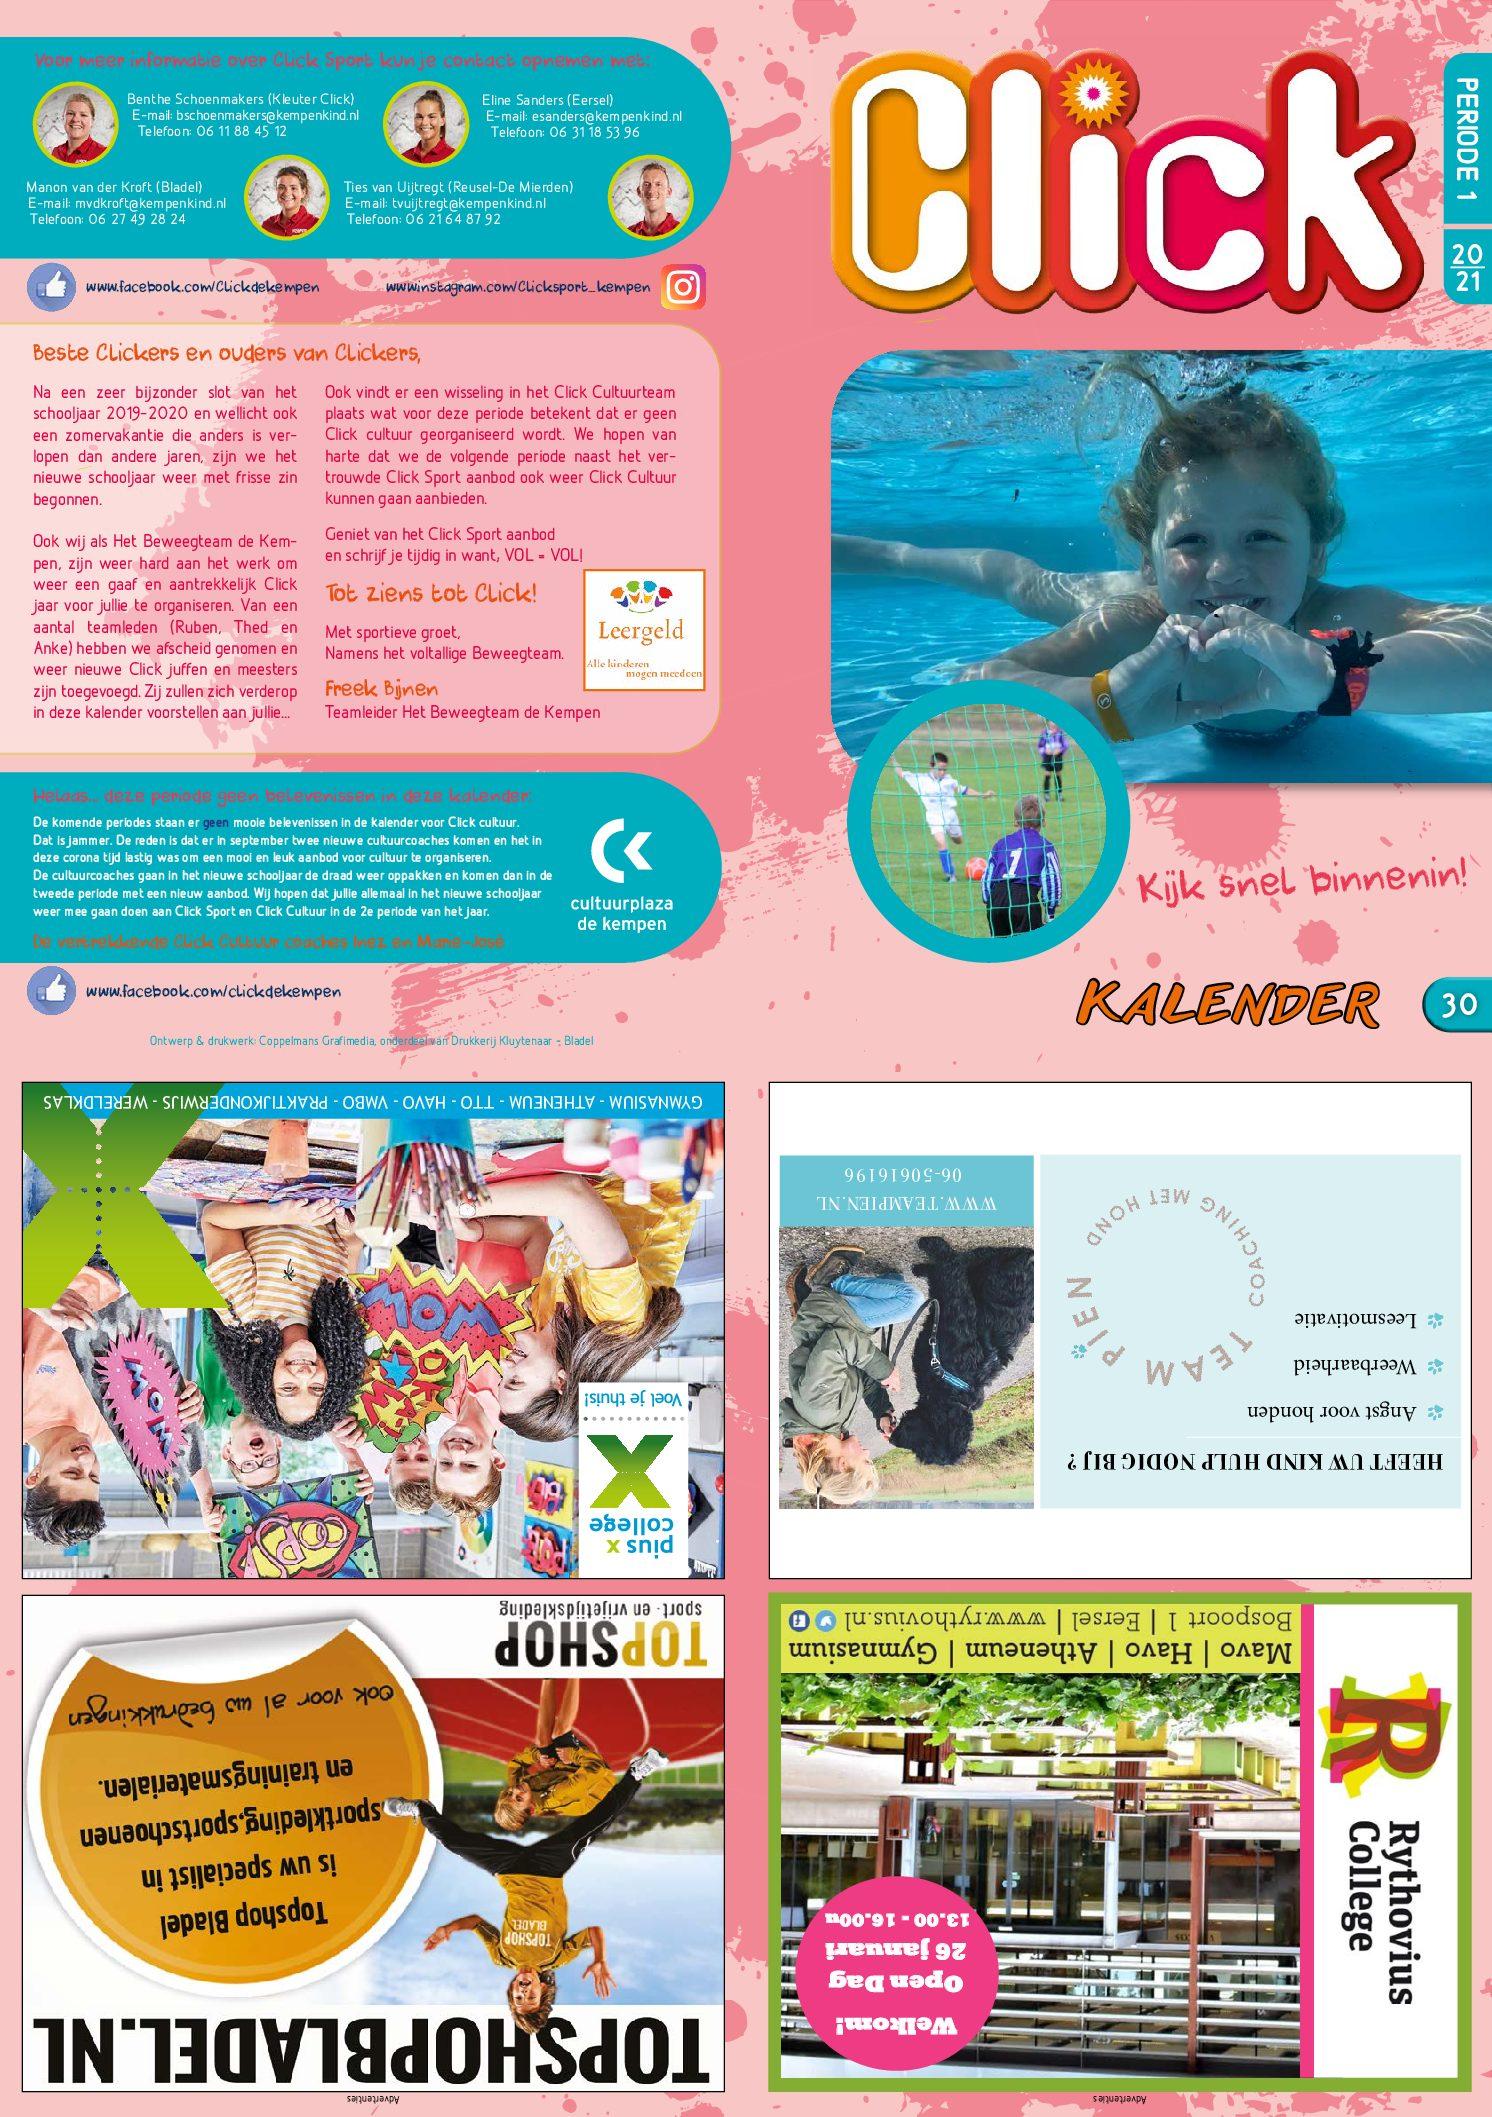 CLICK activiteitenkalender A3-200817